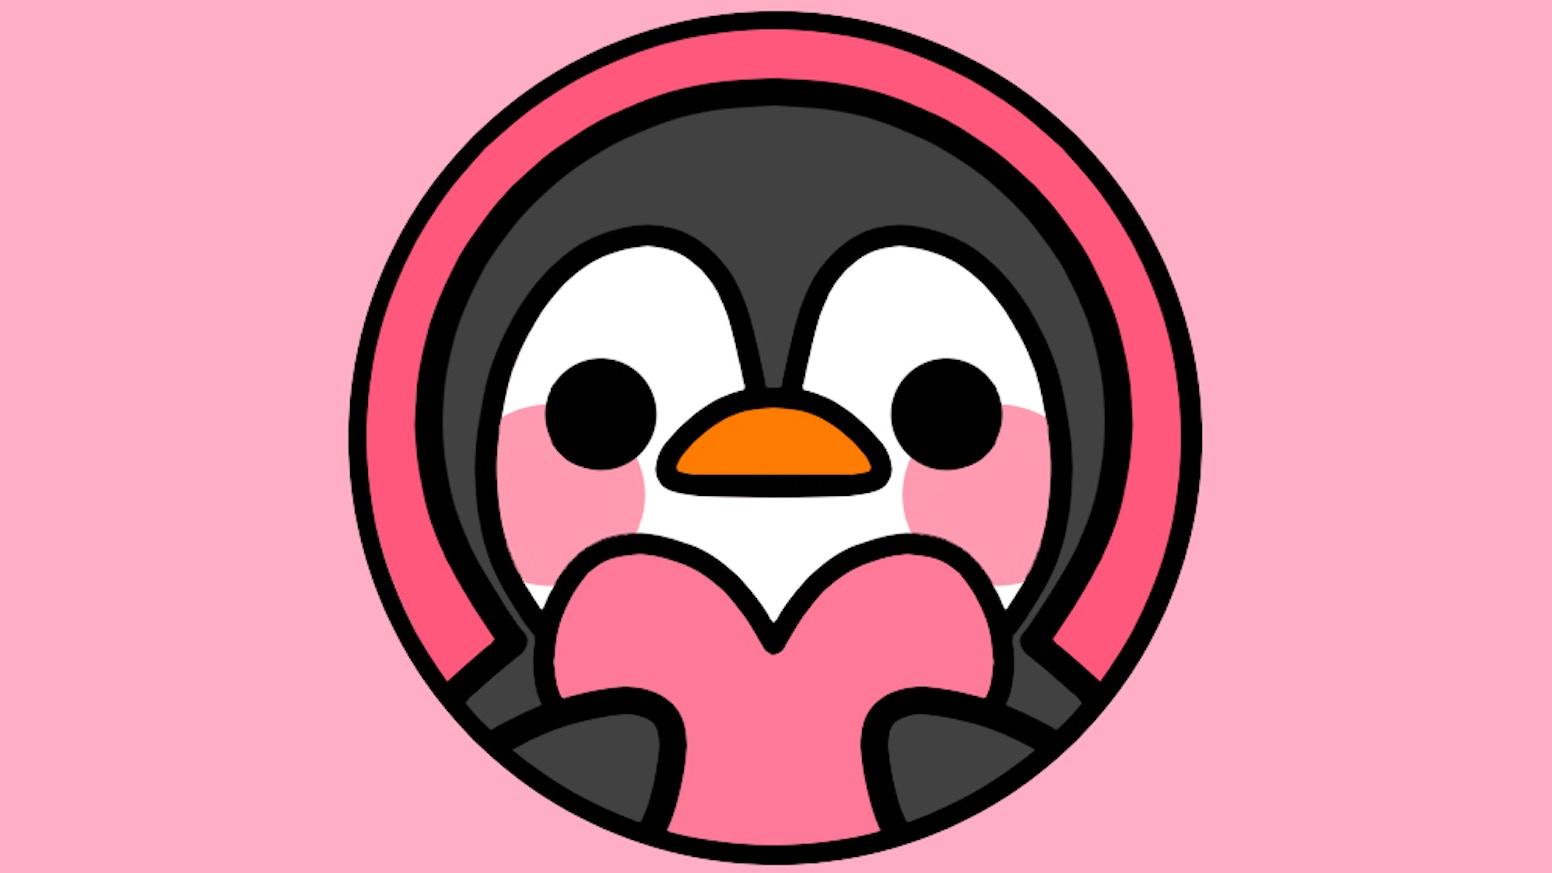 ebec91944 PINGKI - Cute 'Penguin Love' Enamel Pin by Kyahri » Community ...